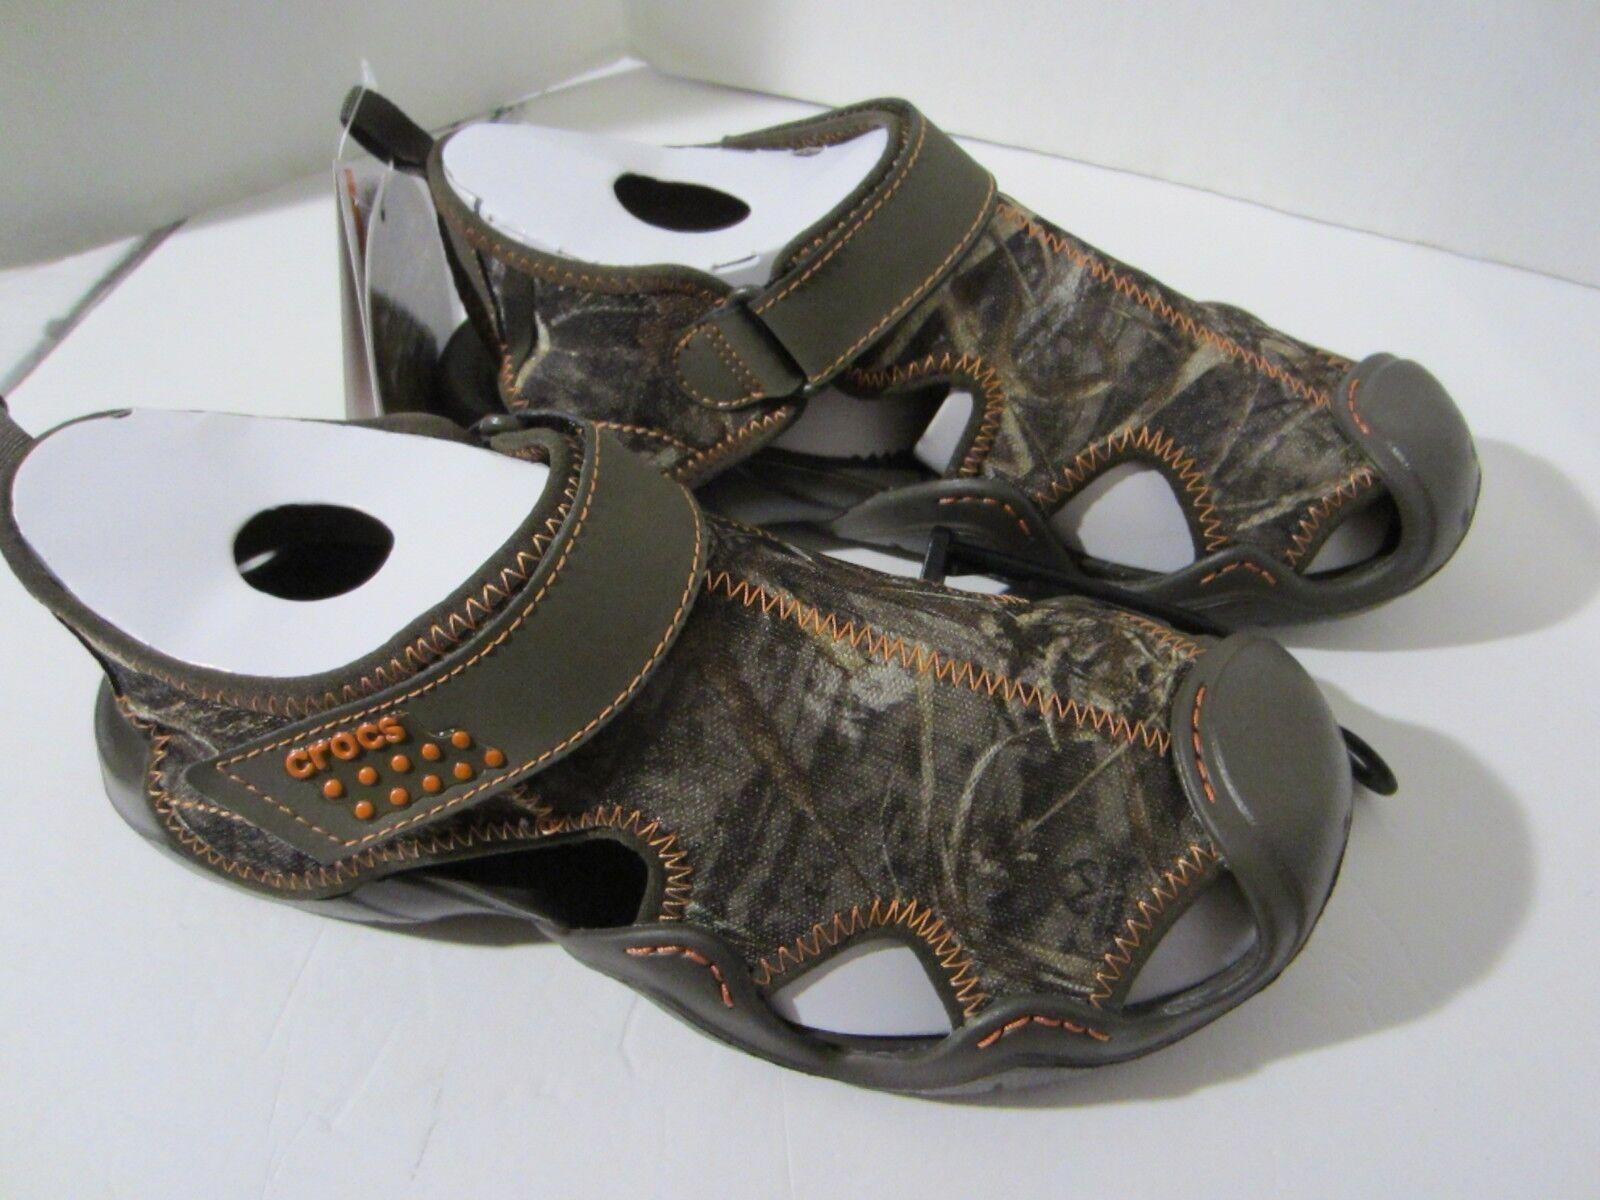 Crocs Swiftwater Realtreemax5 Water Sandal Marron Camo 2018